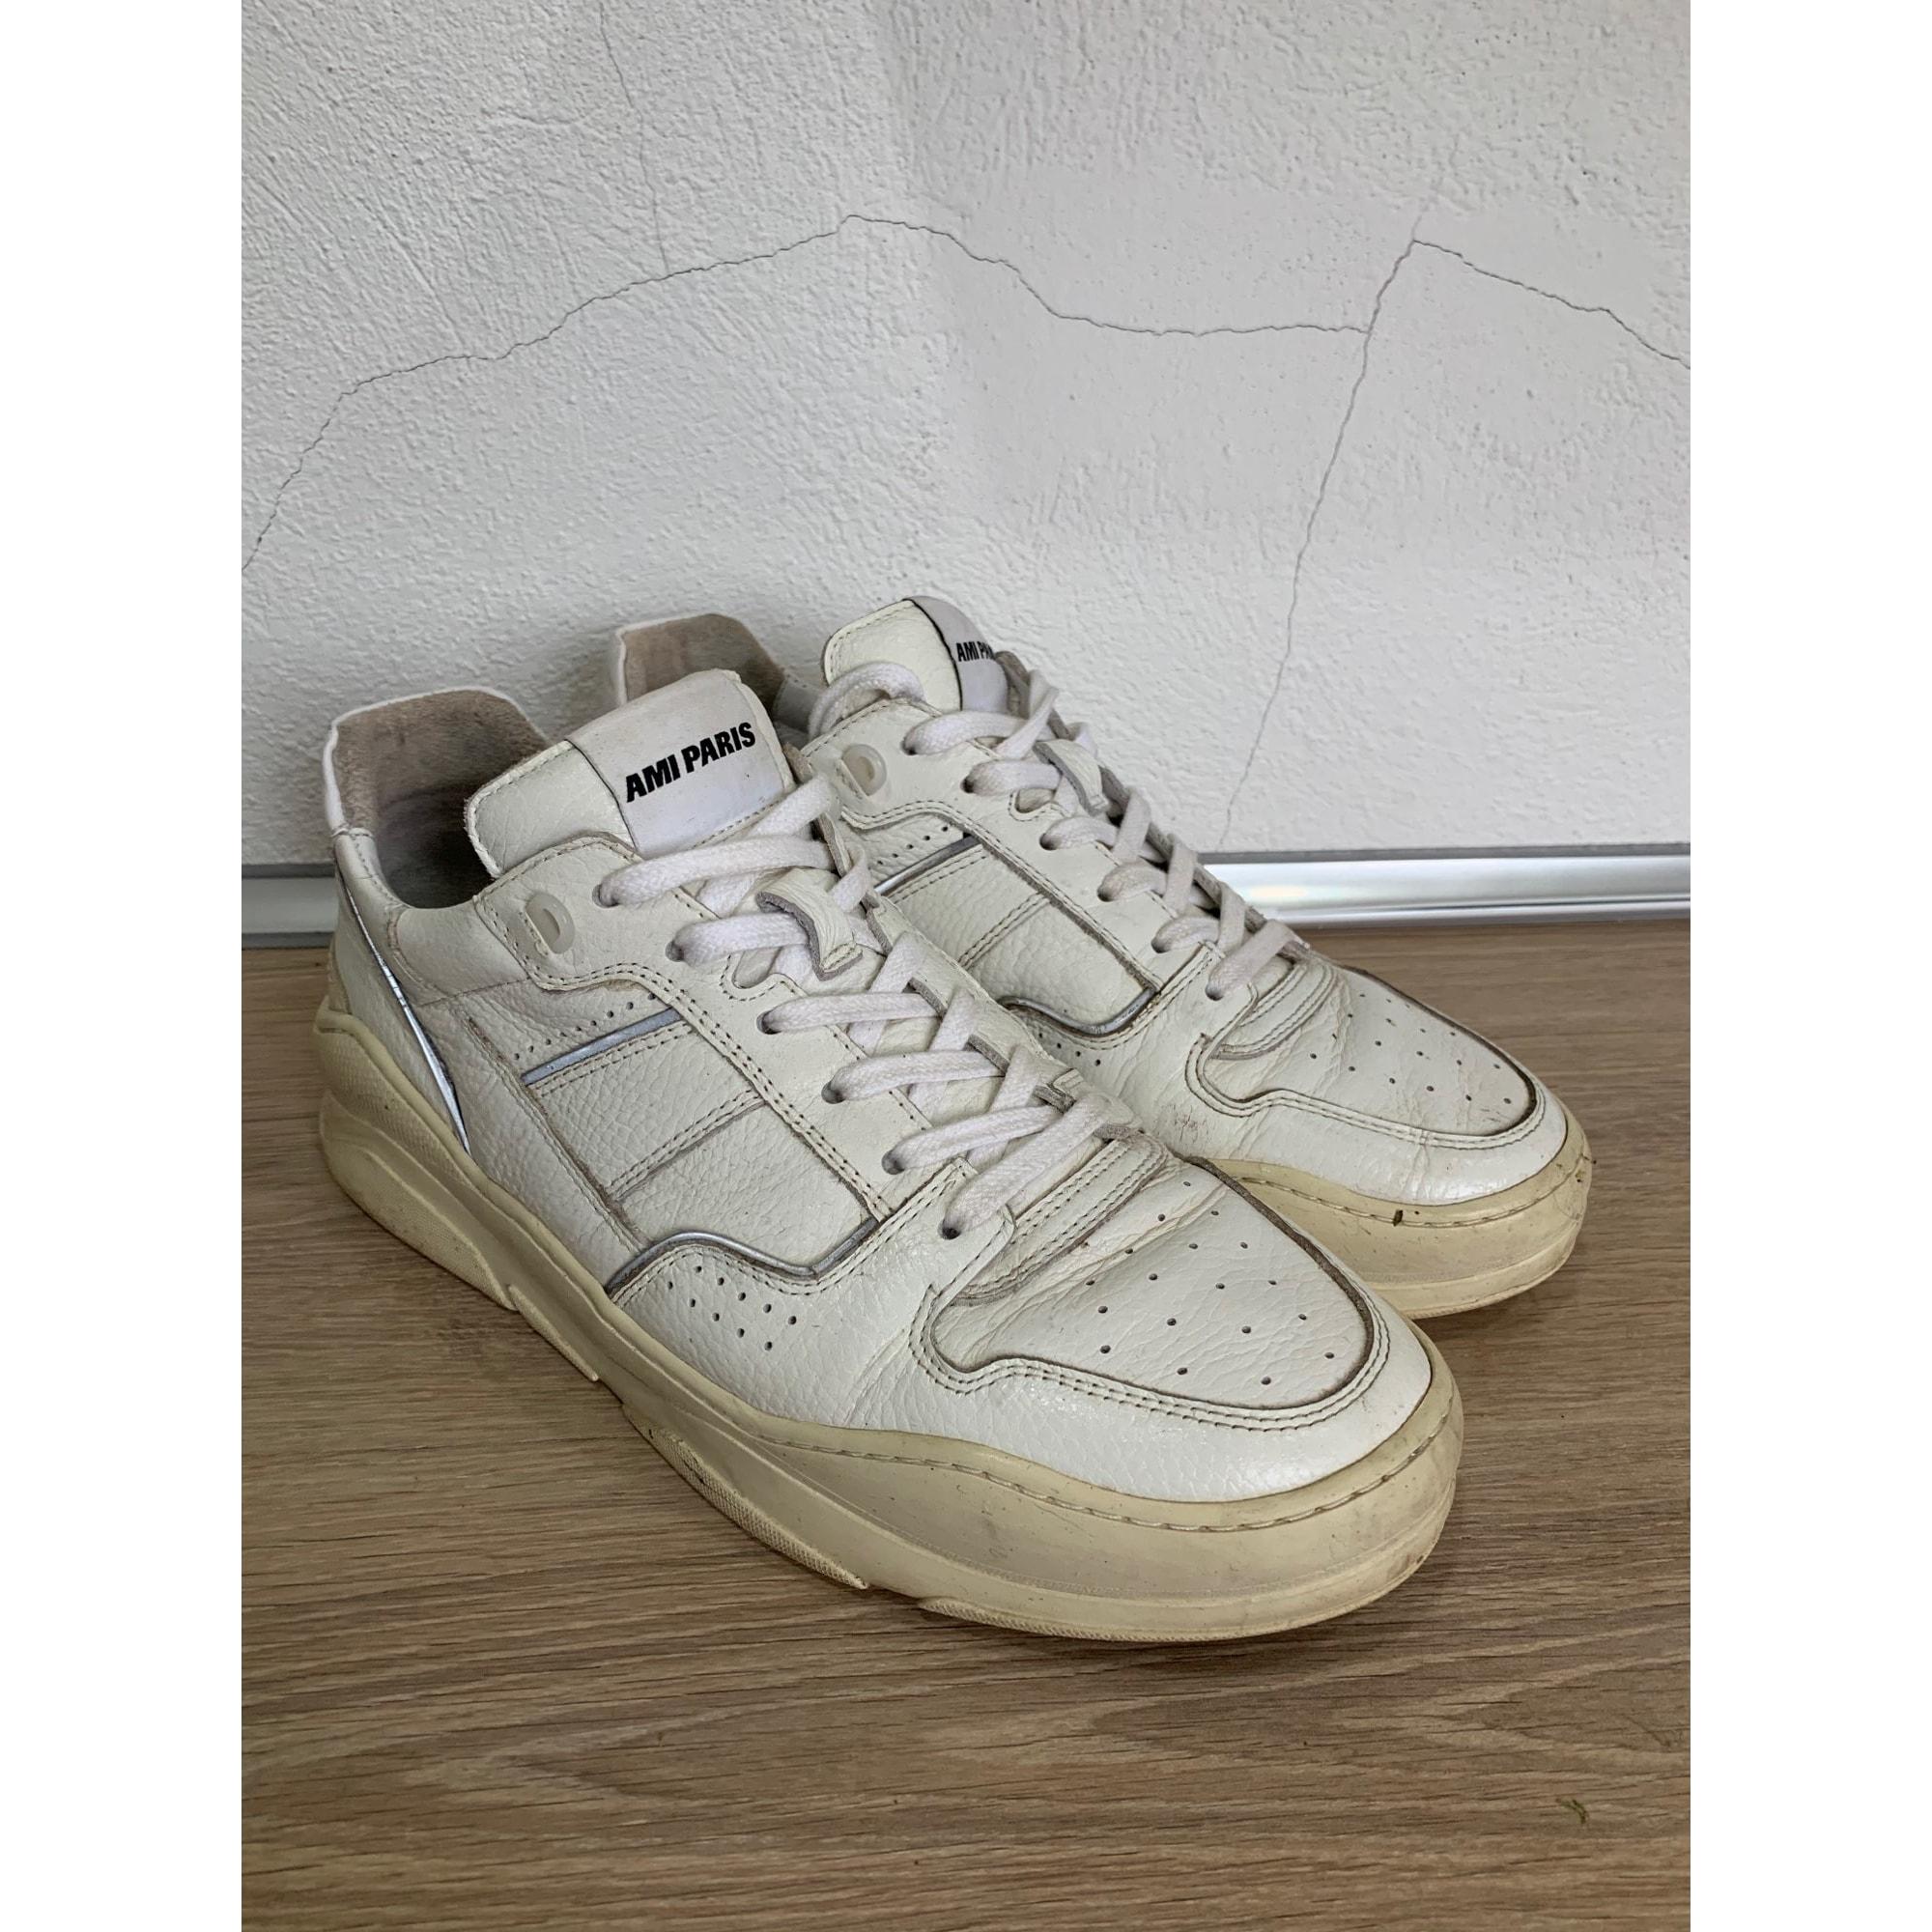 Baskets AMI Blanc, blanc cassé, écru